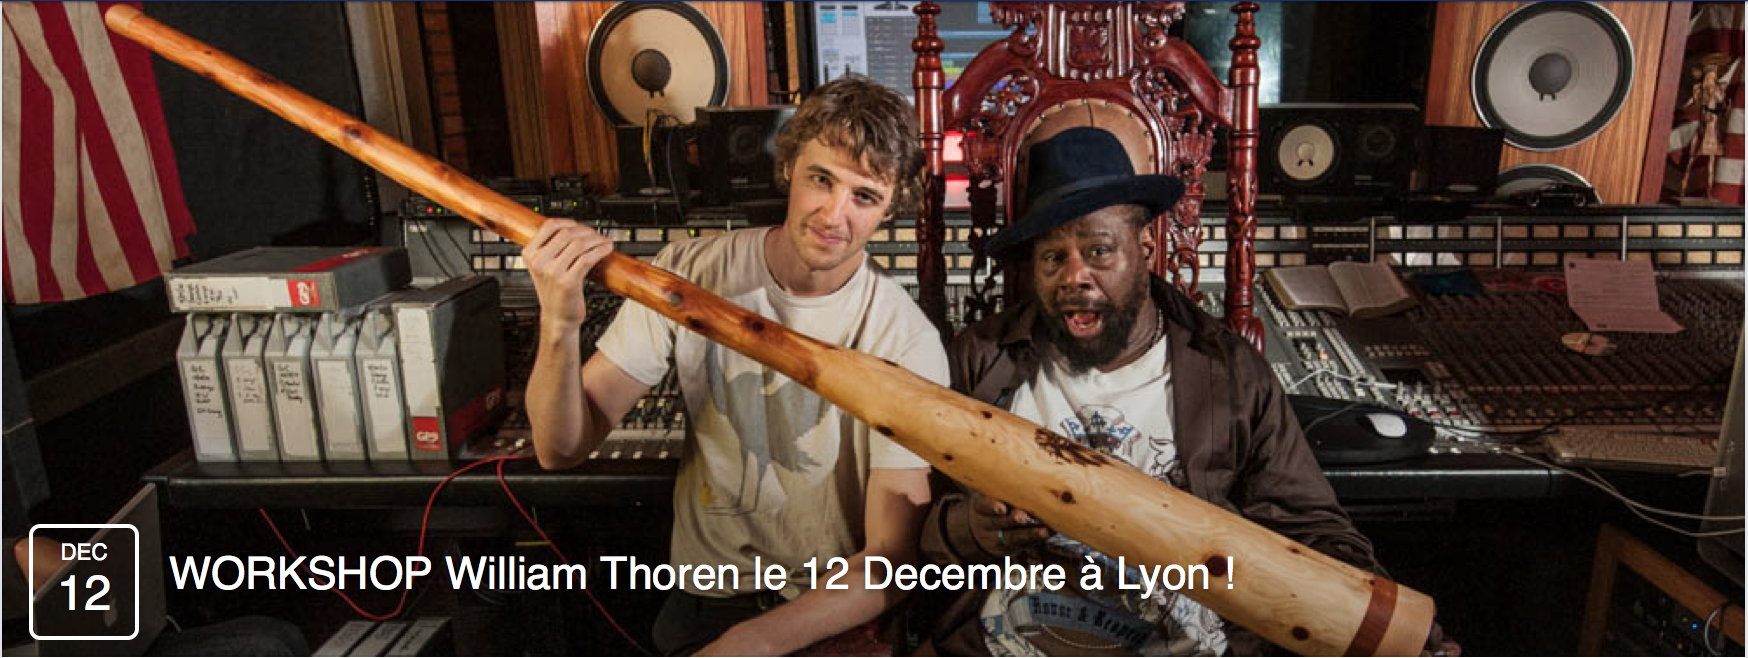 William Thoren Wet Didgeridoo Lyon France Association Australian Vibrations